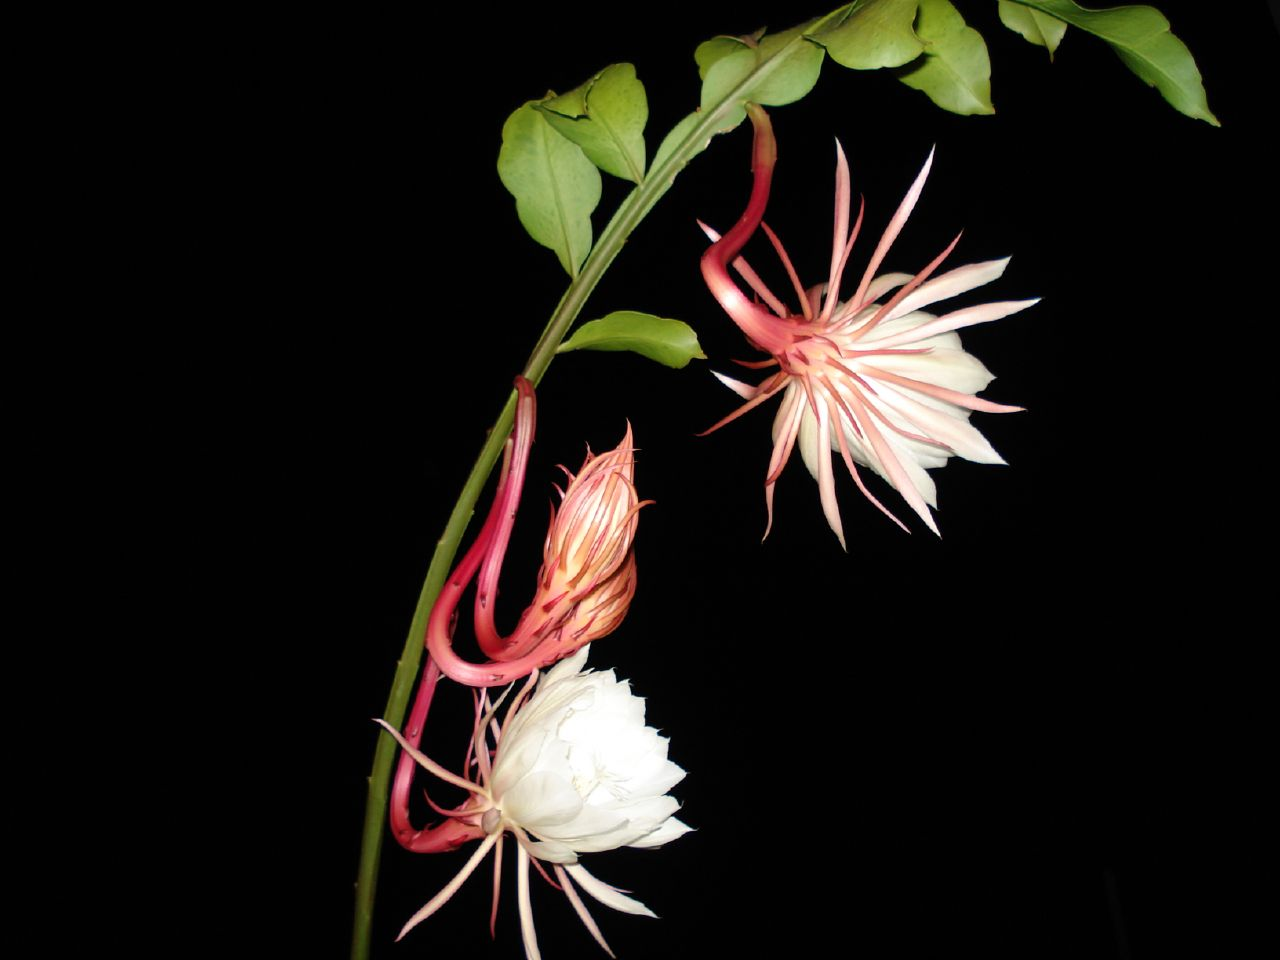 https://i0.wp.com/upload.wikimedia.org/wikipedia/commons/7/7a/Epiphyllum_oxypetalum200669888.jpg